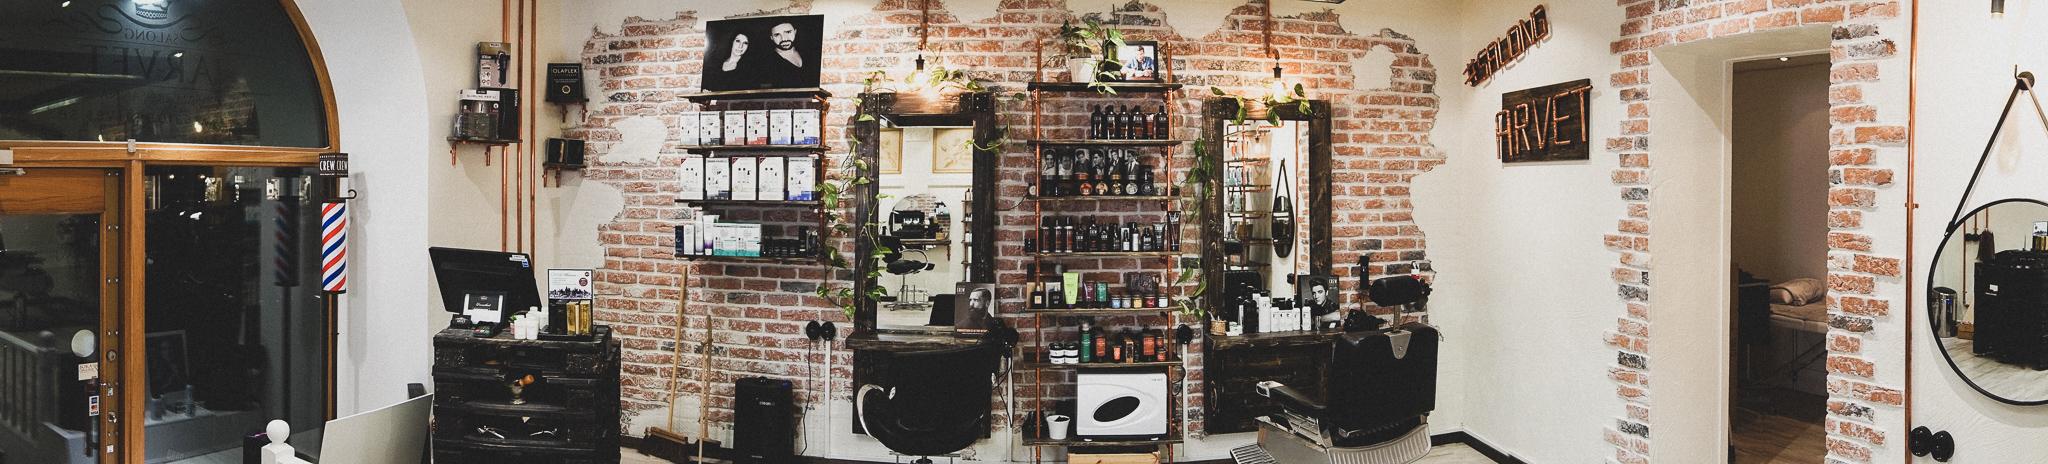 barbershop östermalm